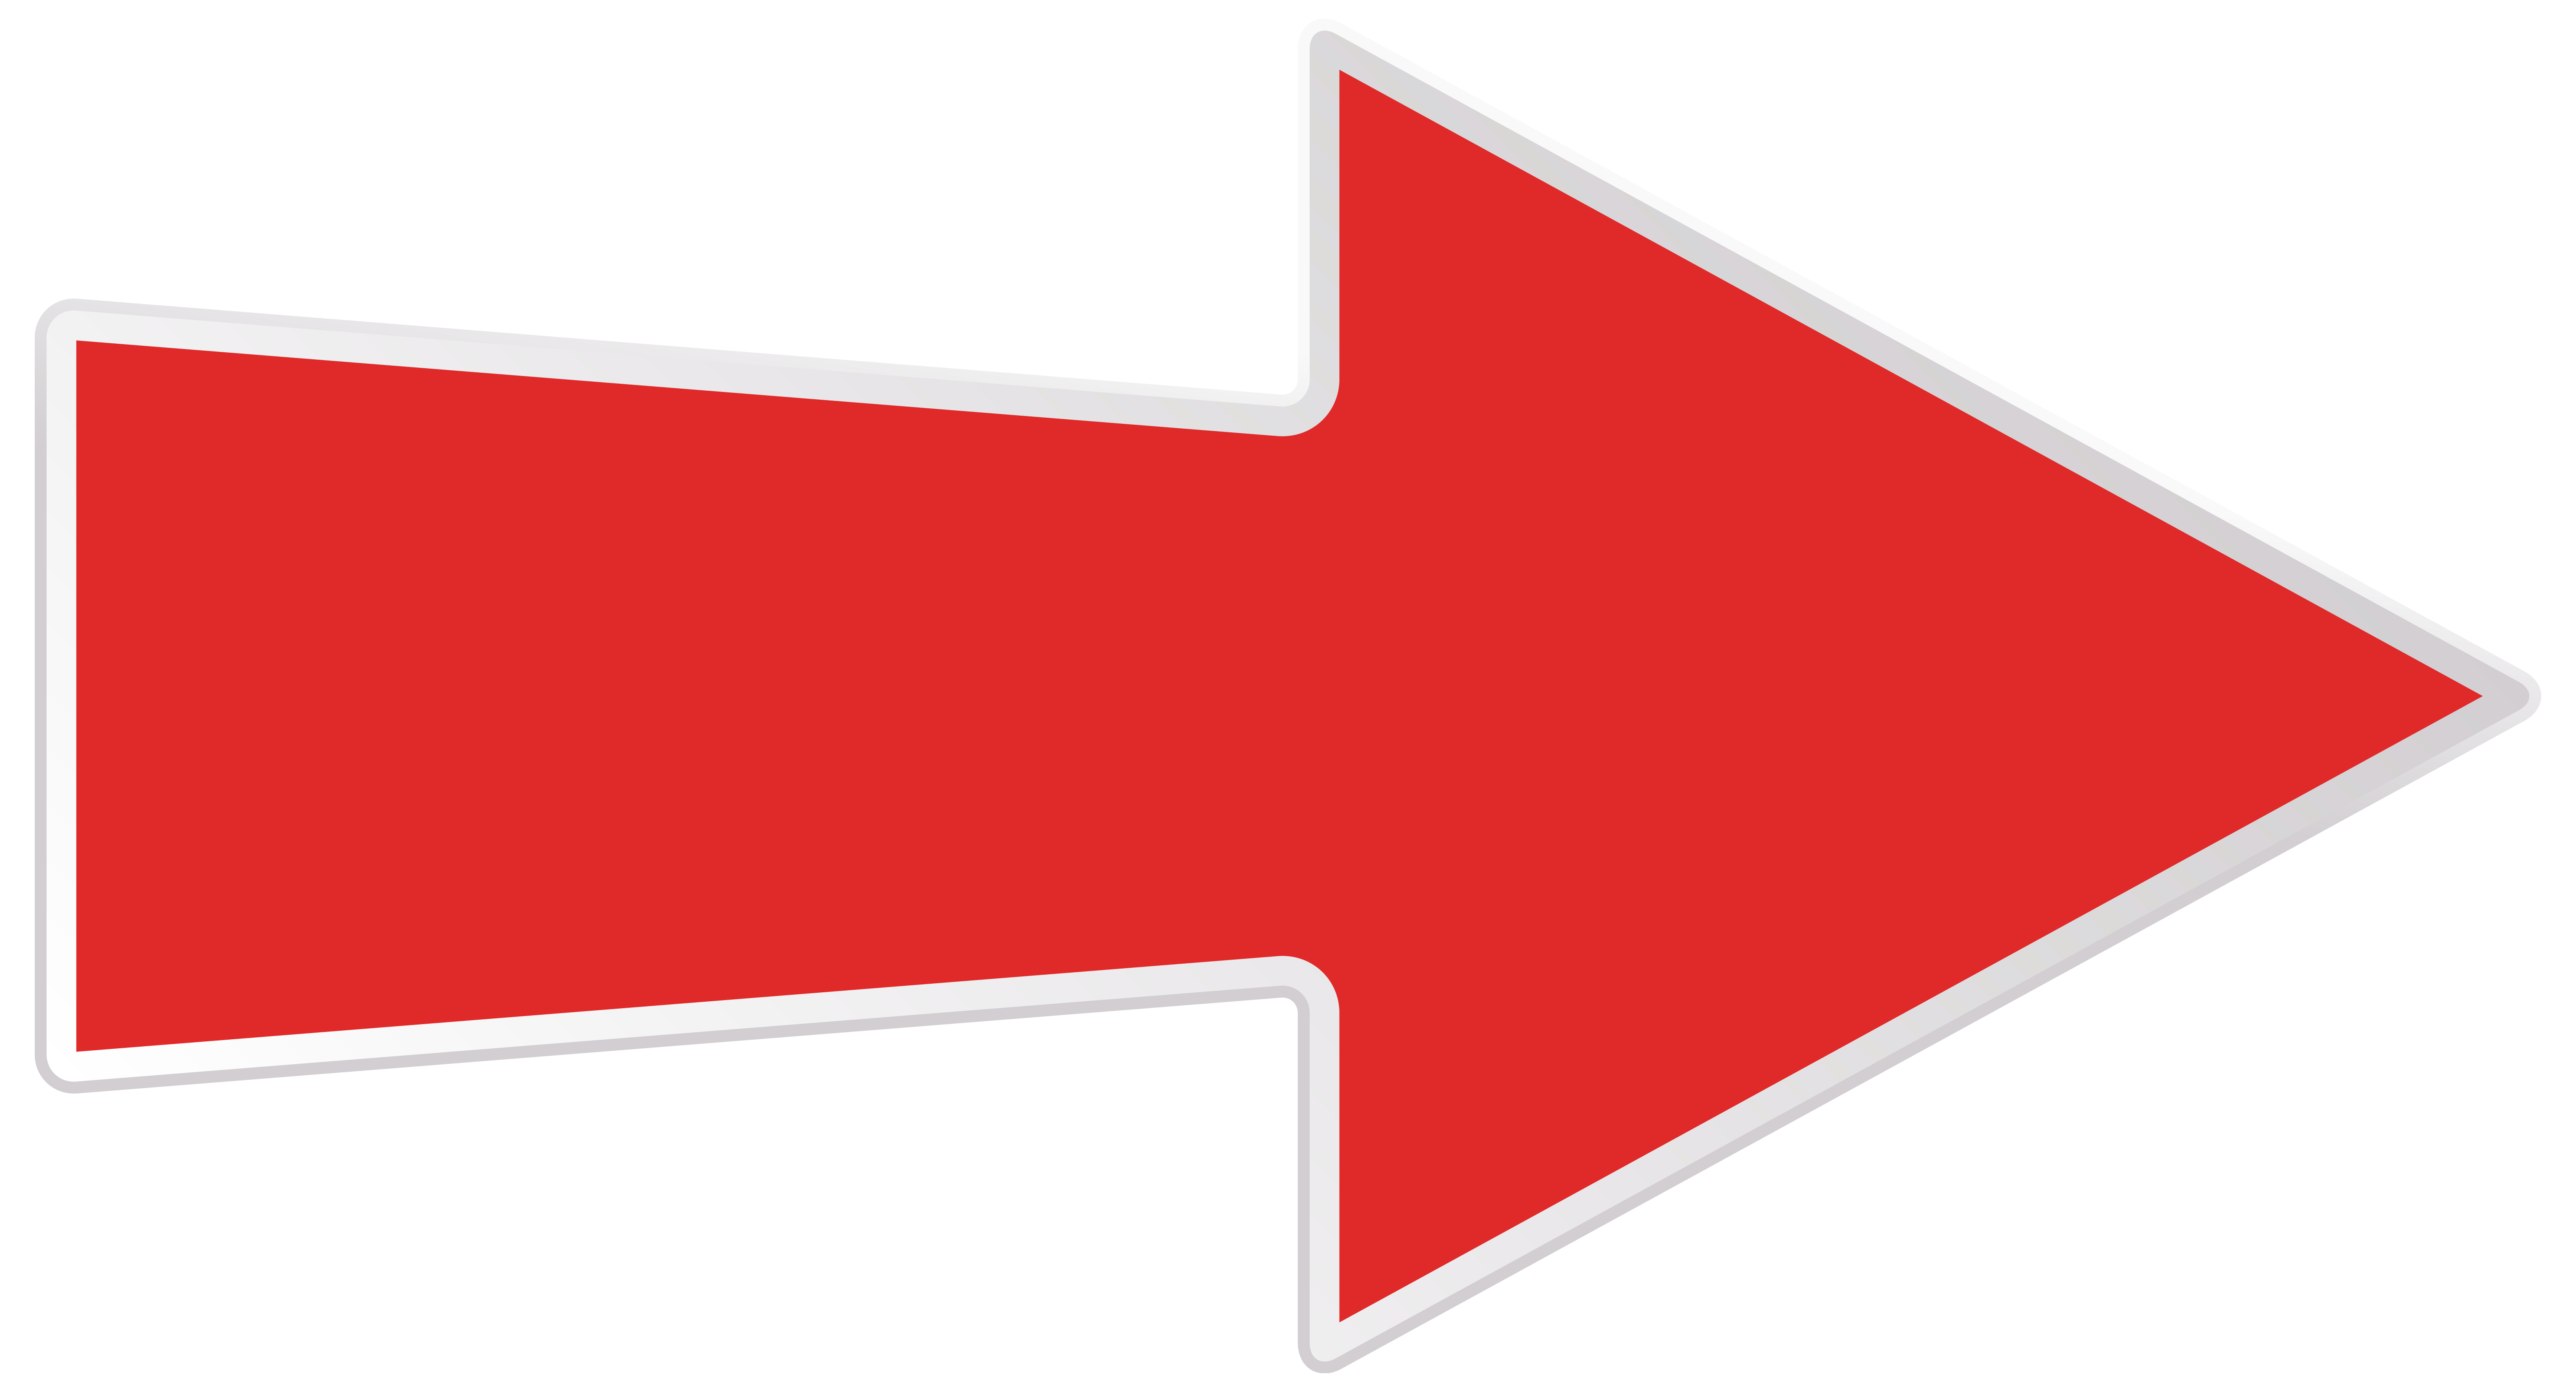 Block arrow clipart banner stock Red Right Arrow Transparent PNG Clip Art Image | Cosas que me ... banner stock